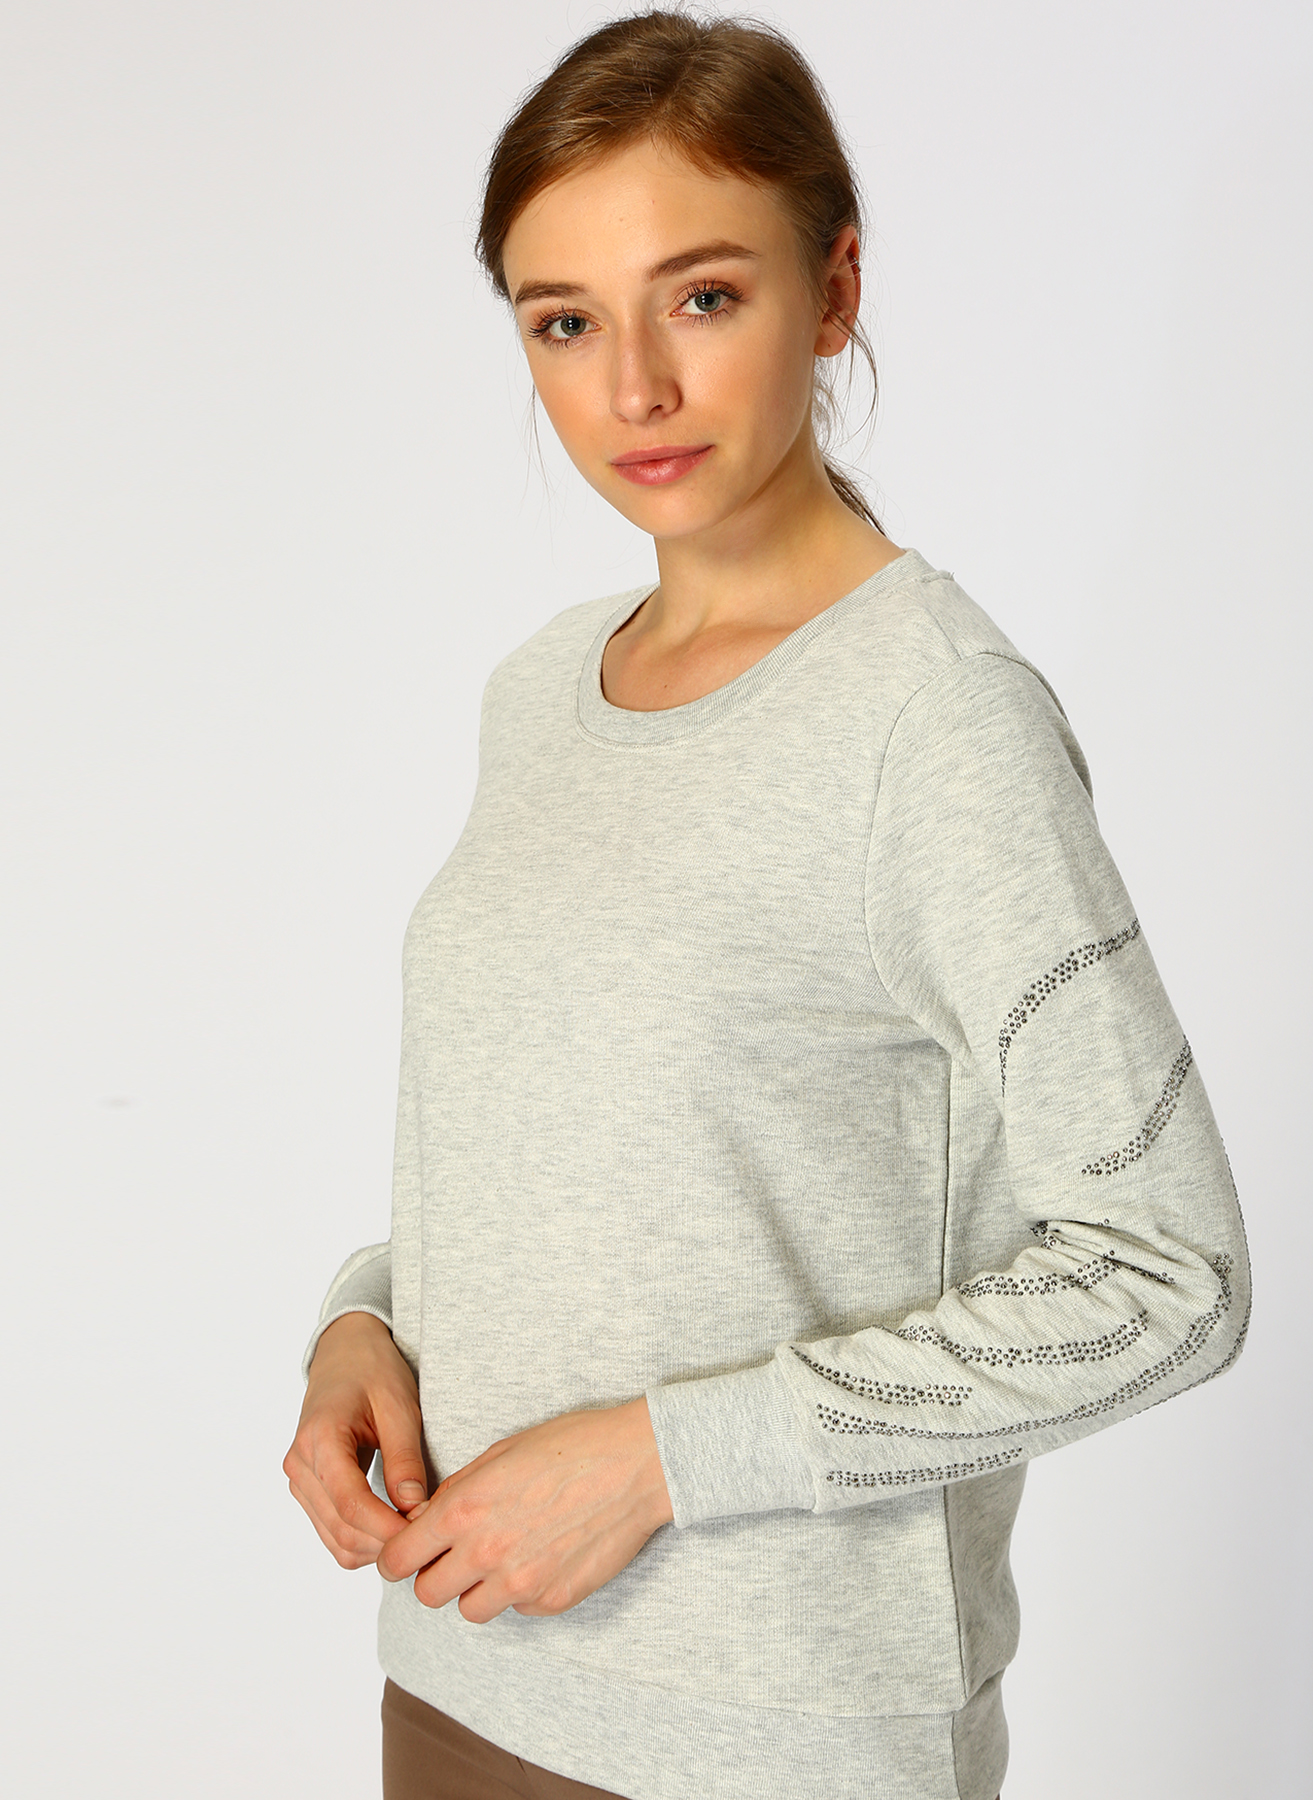 Network Gri Sweatshirt XL 5001699163005 Ürün Resmi